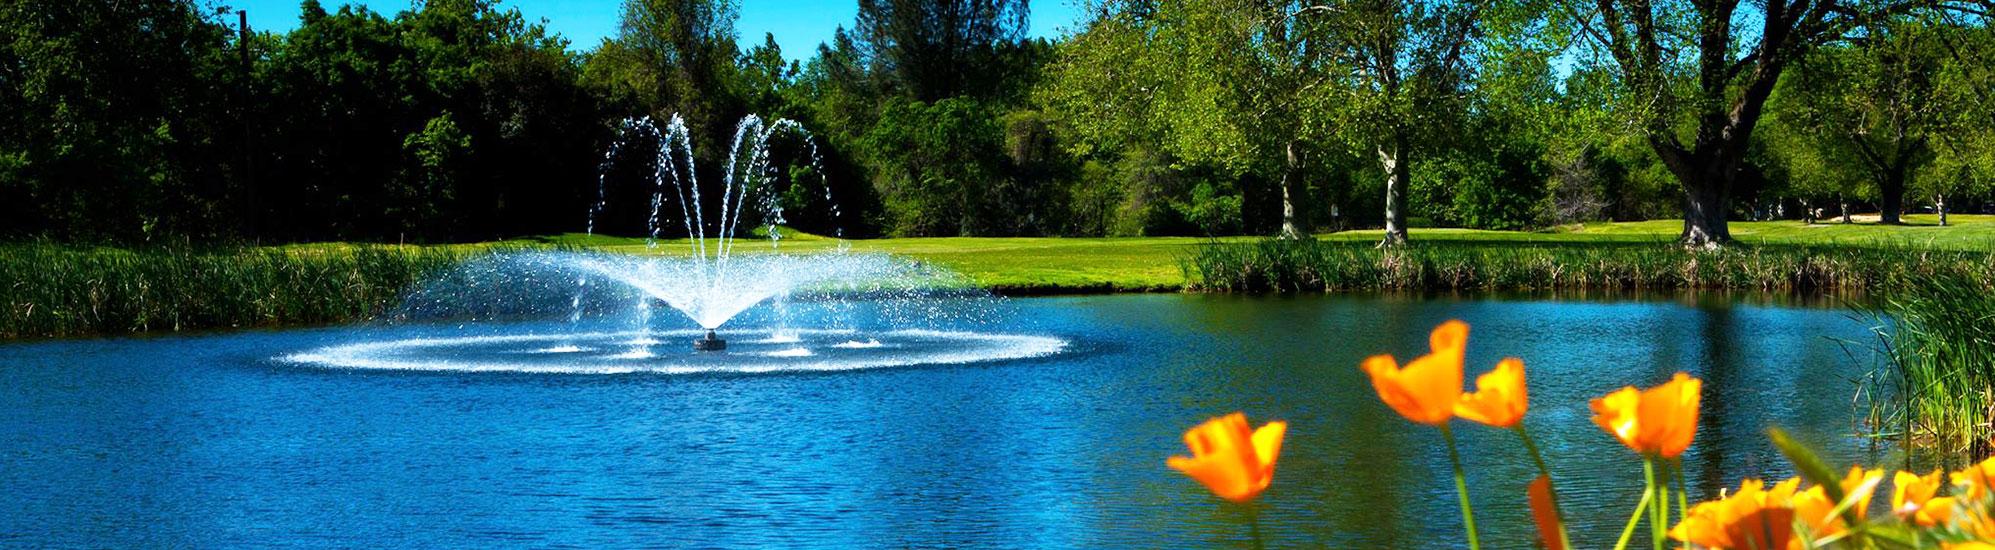 21+ Bidwell golf now ideas in 2021